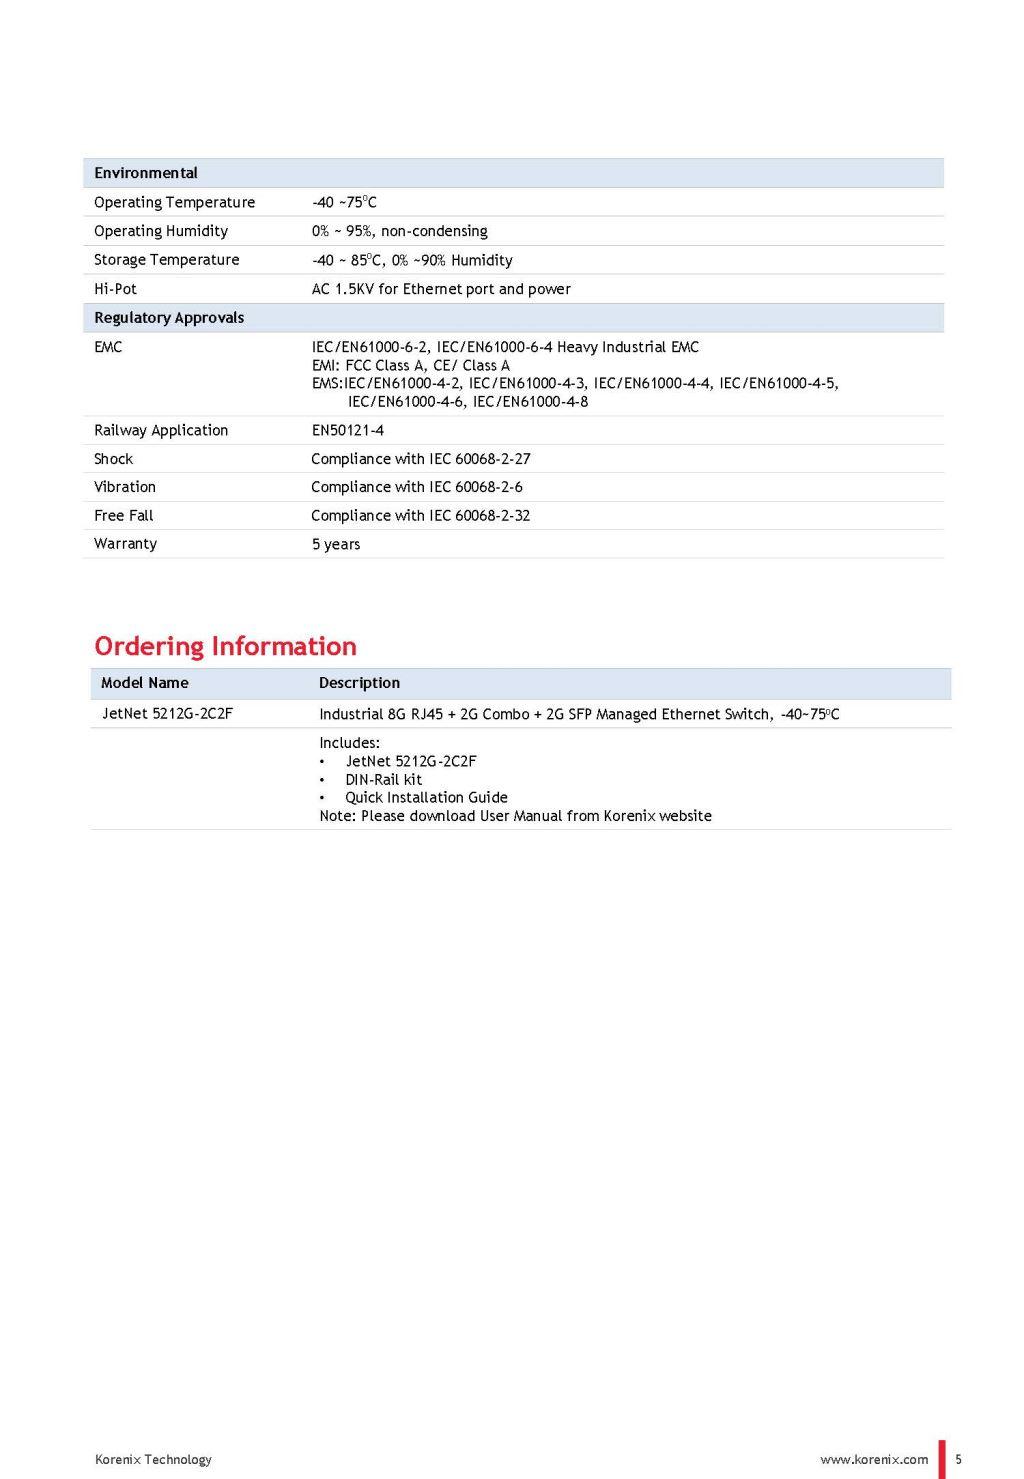 JetNet 5212G-2C2FIndustrial 8G RJ45 + 2G Combo + 2G SFP Managed Ethernet Switch